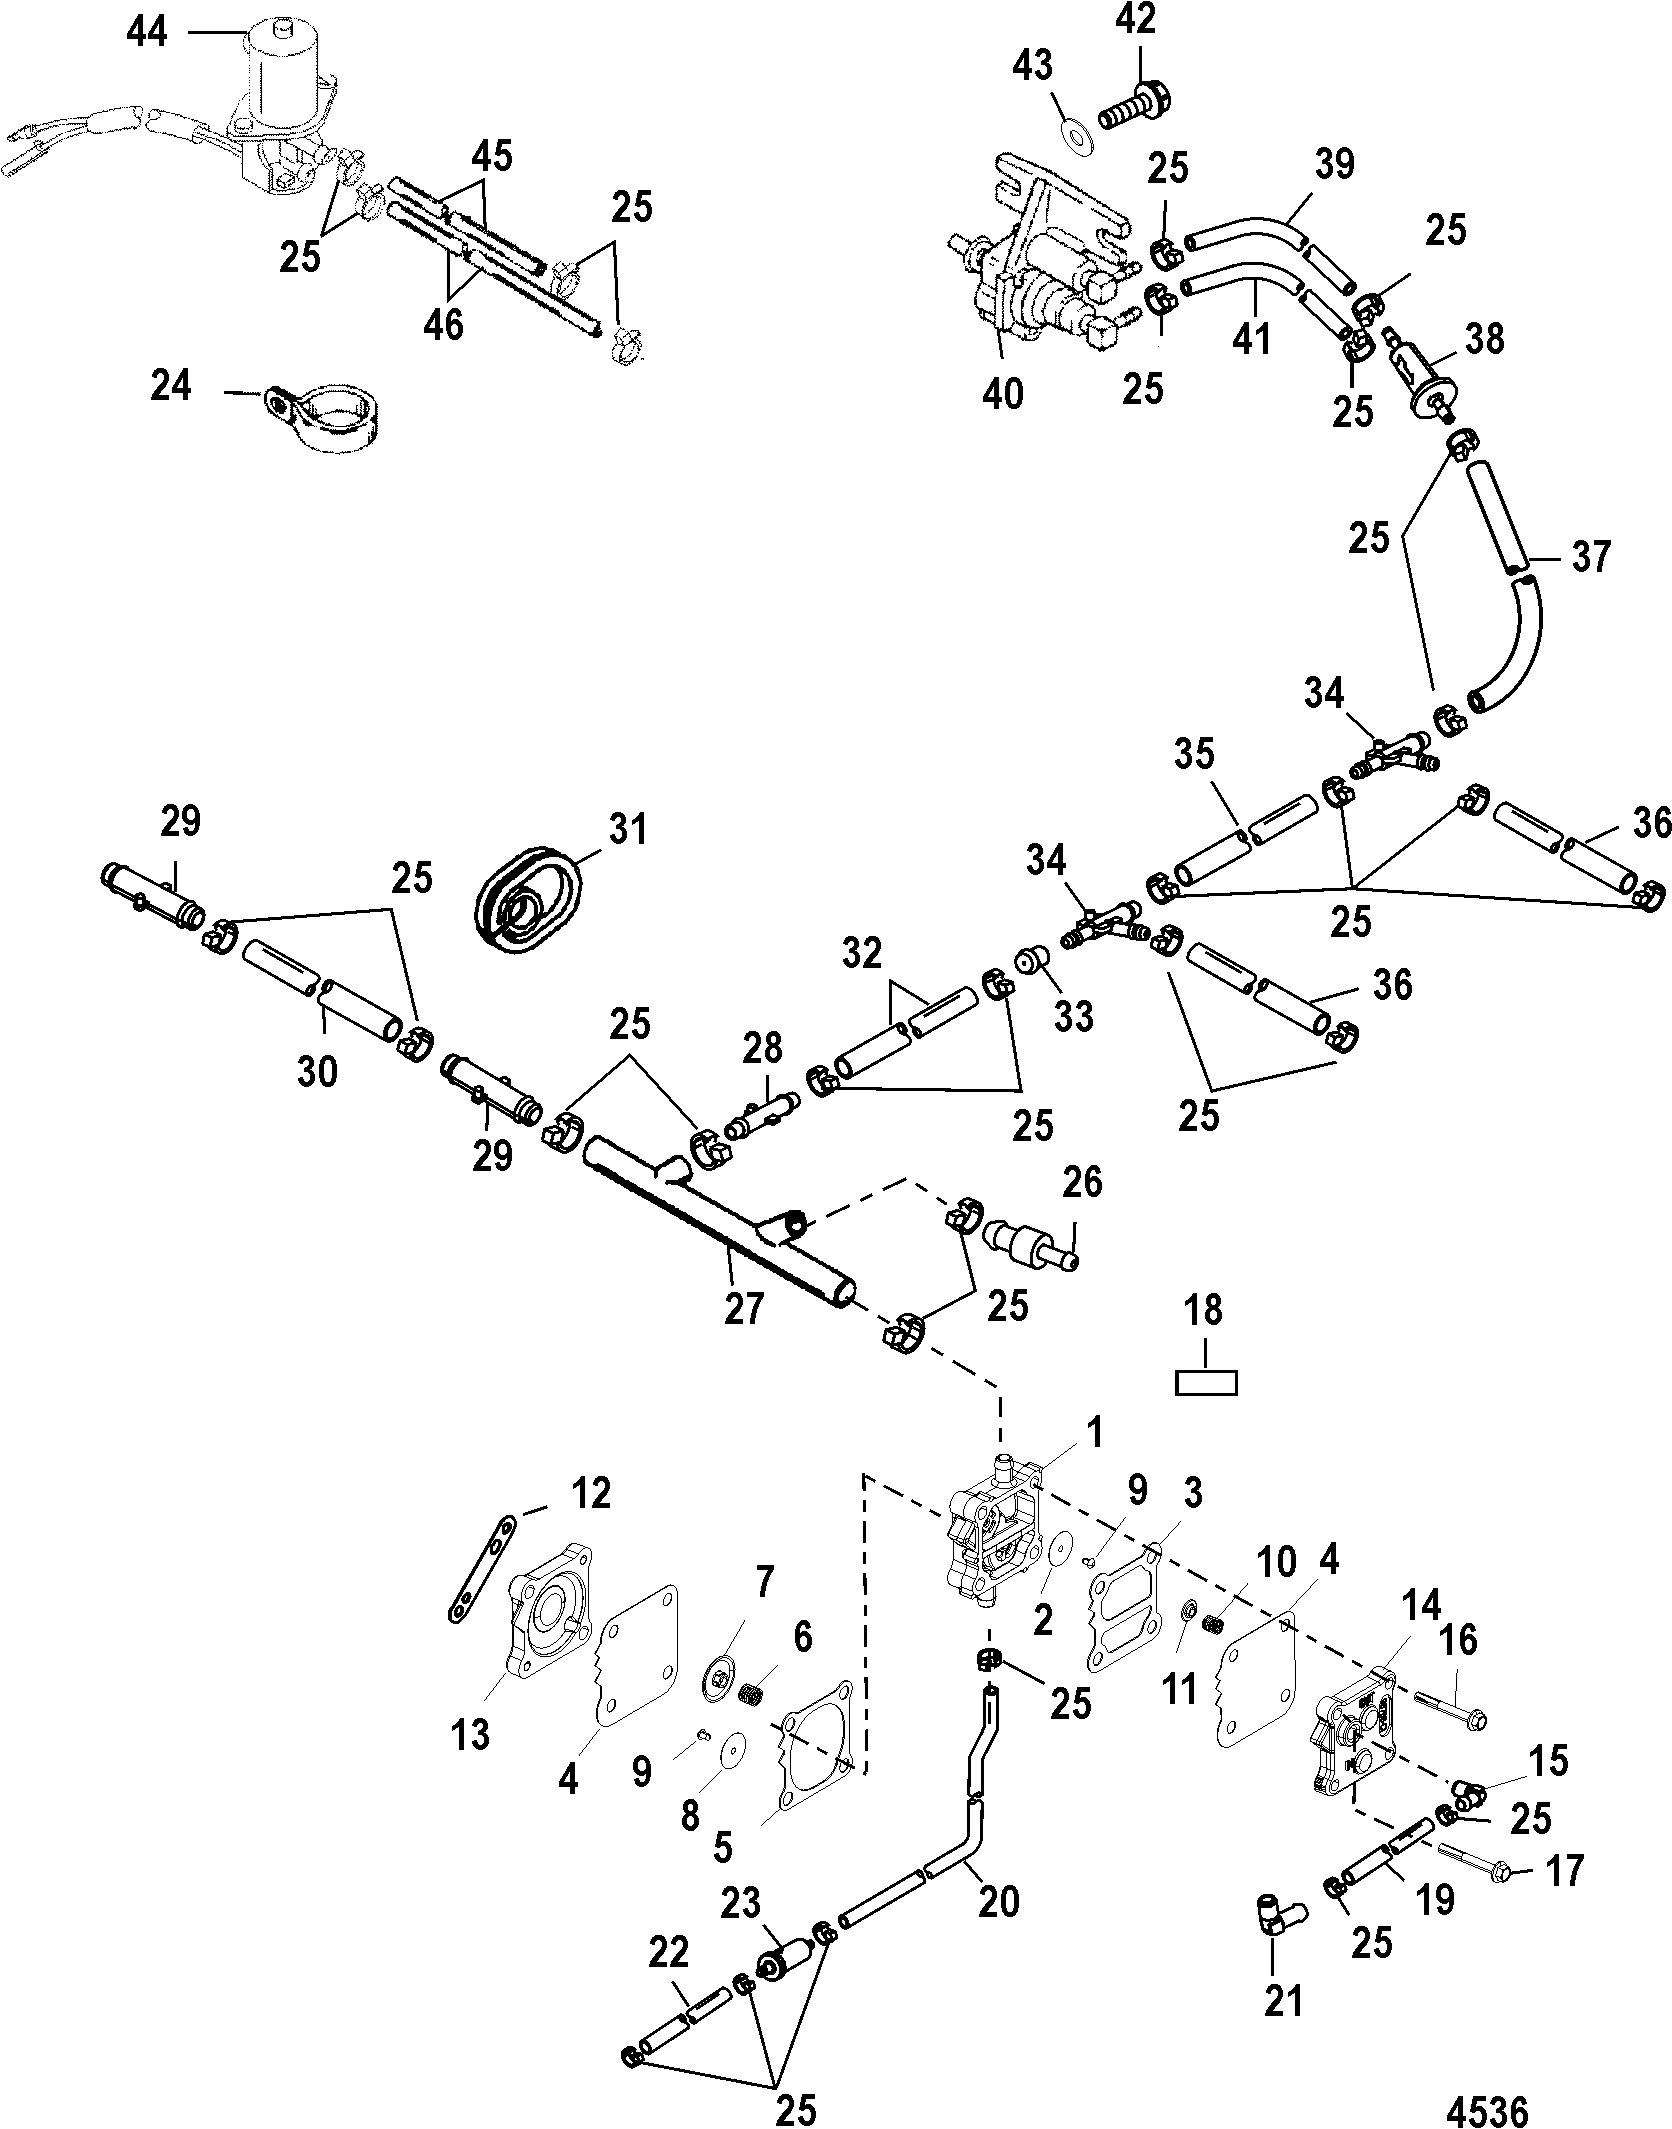 Fuel Pump For Mariner Mercury 115 125 Hp Jet 80 4